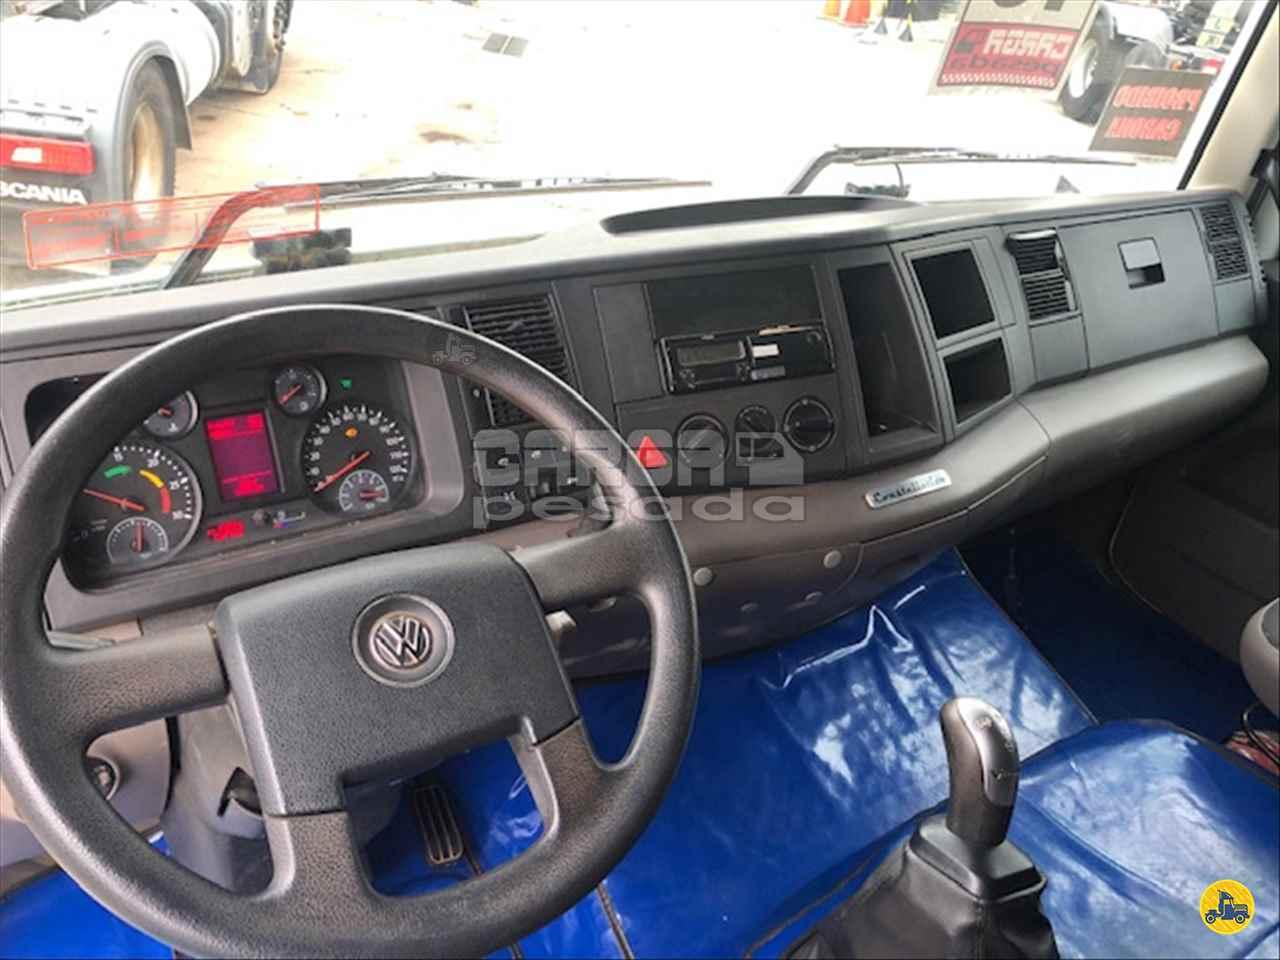 VOLKSWAGEN VW 25420 184000km 2016/2016 Carga Pesada Caminhões